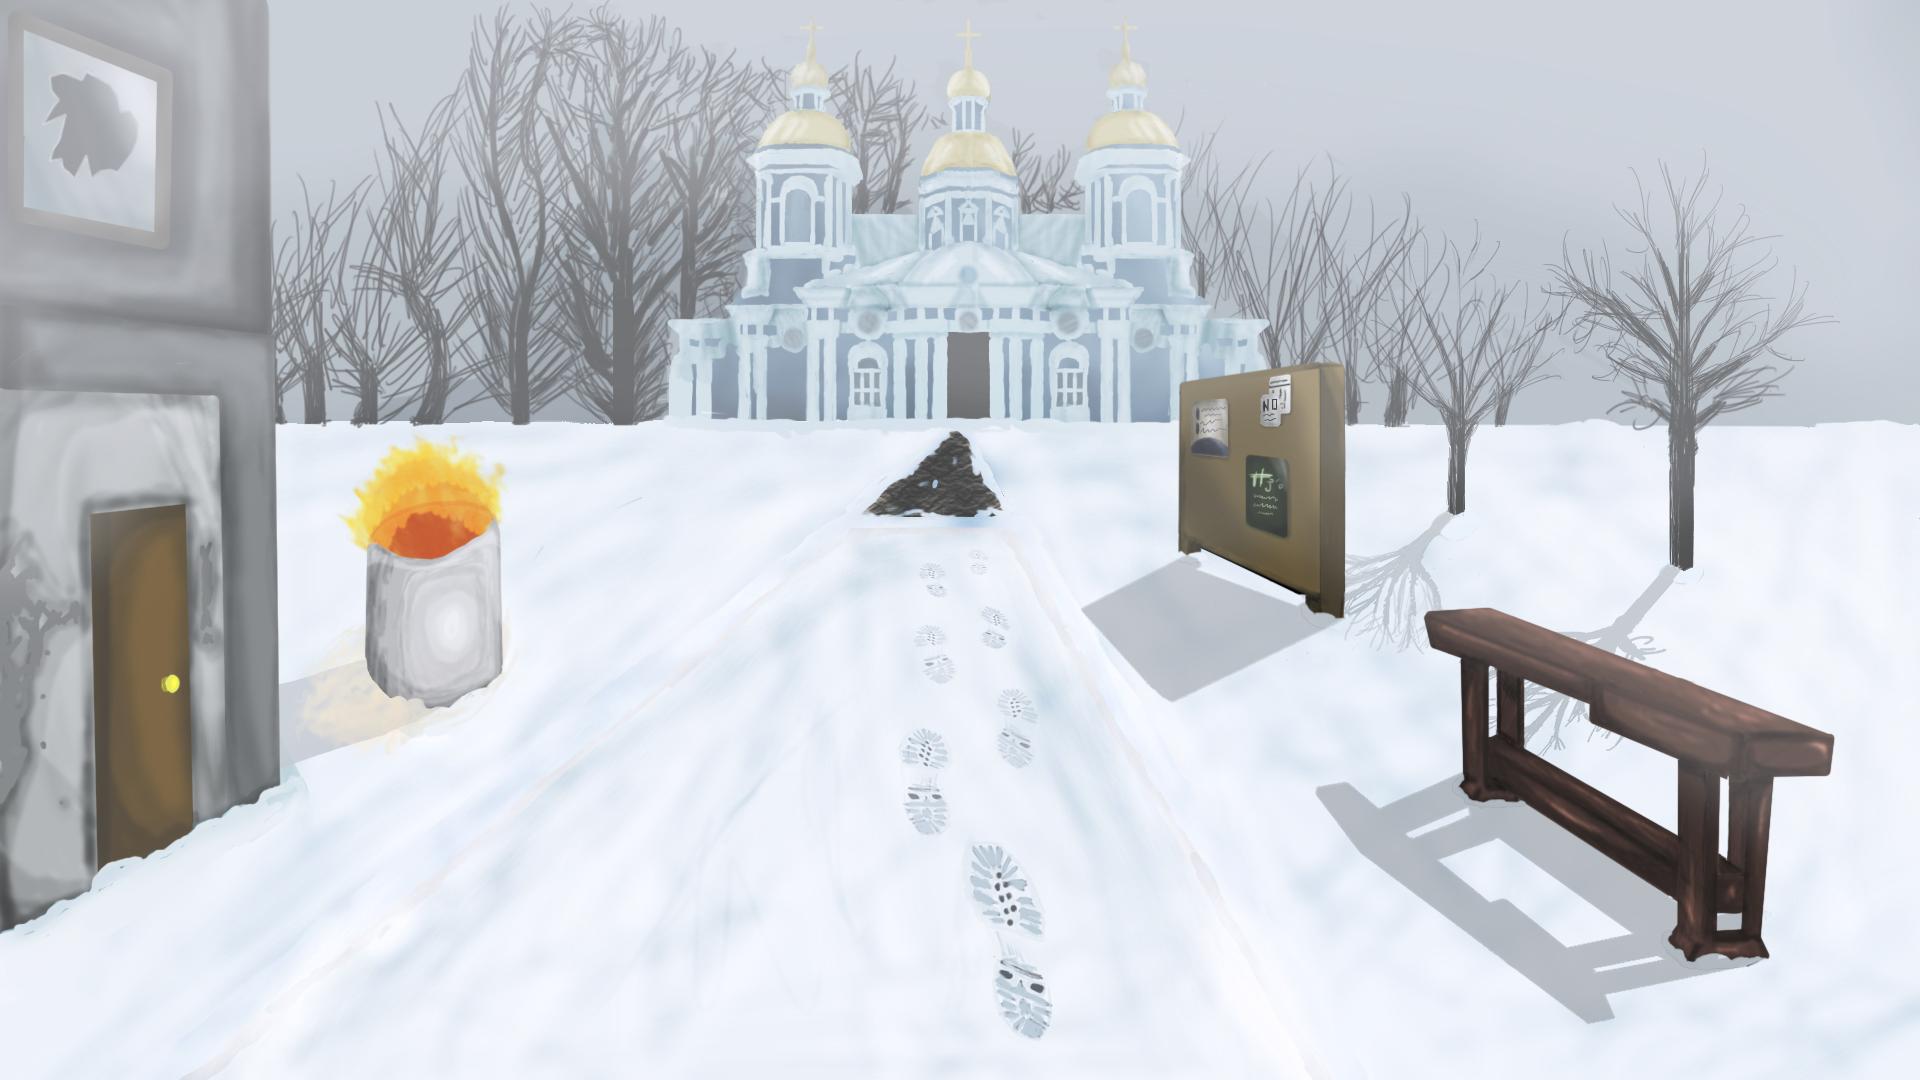 Post-Apocalyptic Saint Petersburg